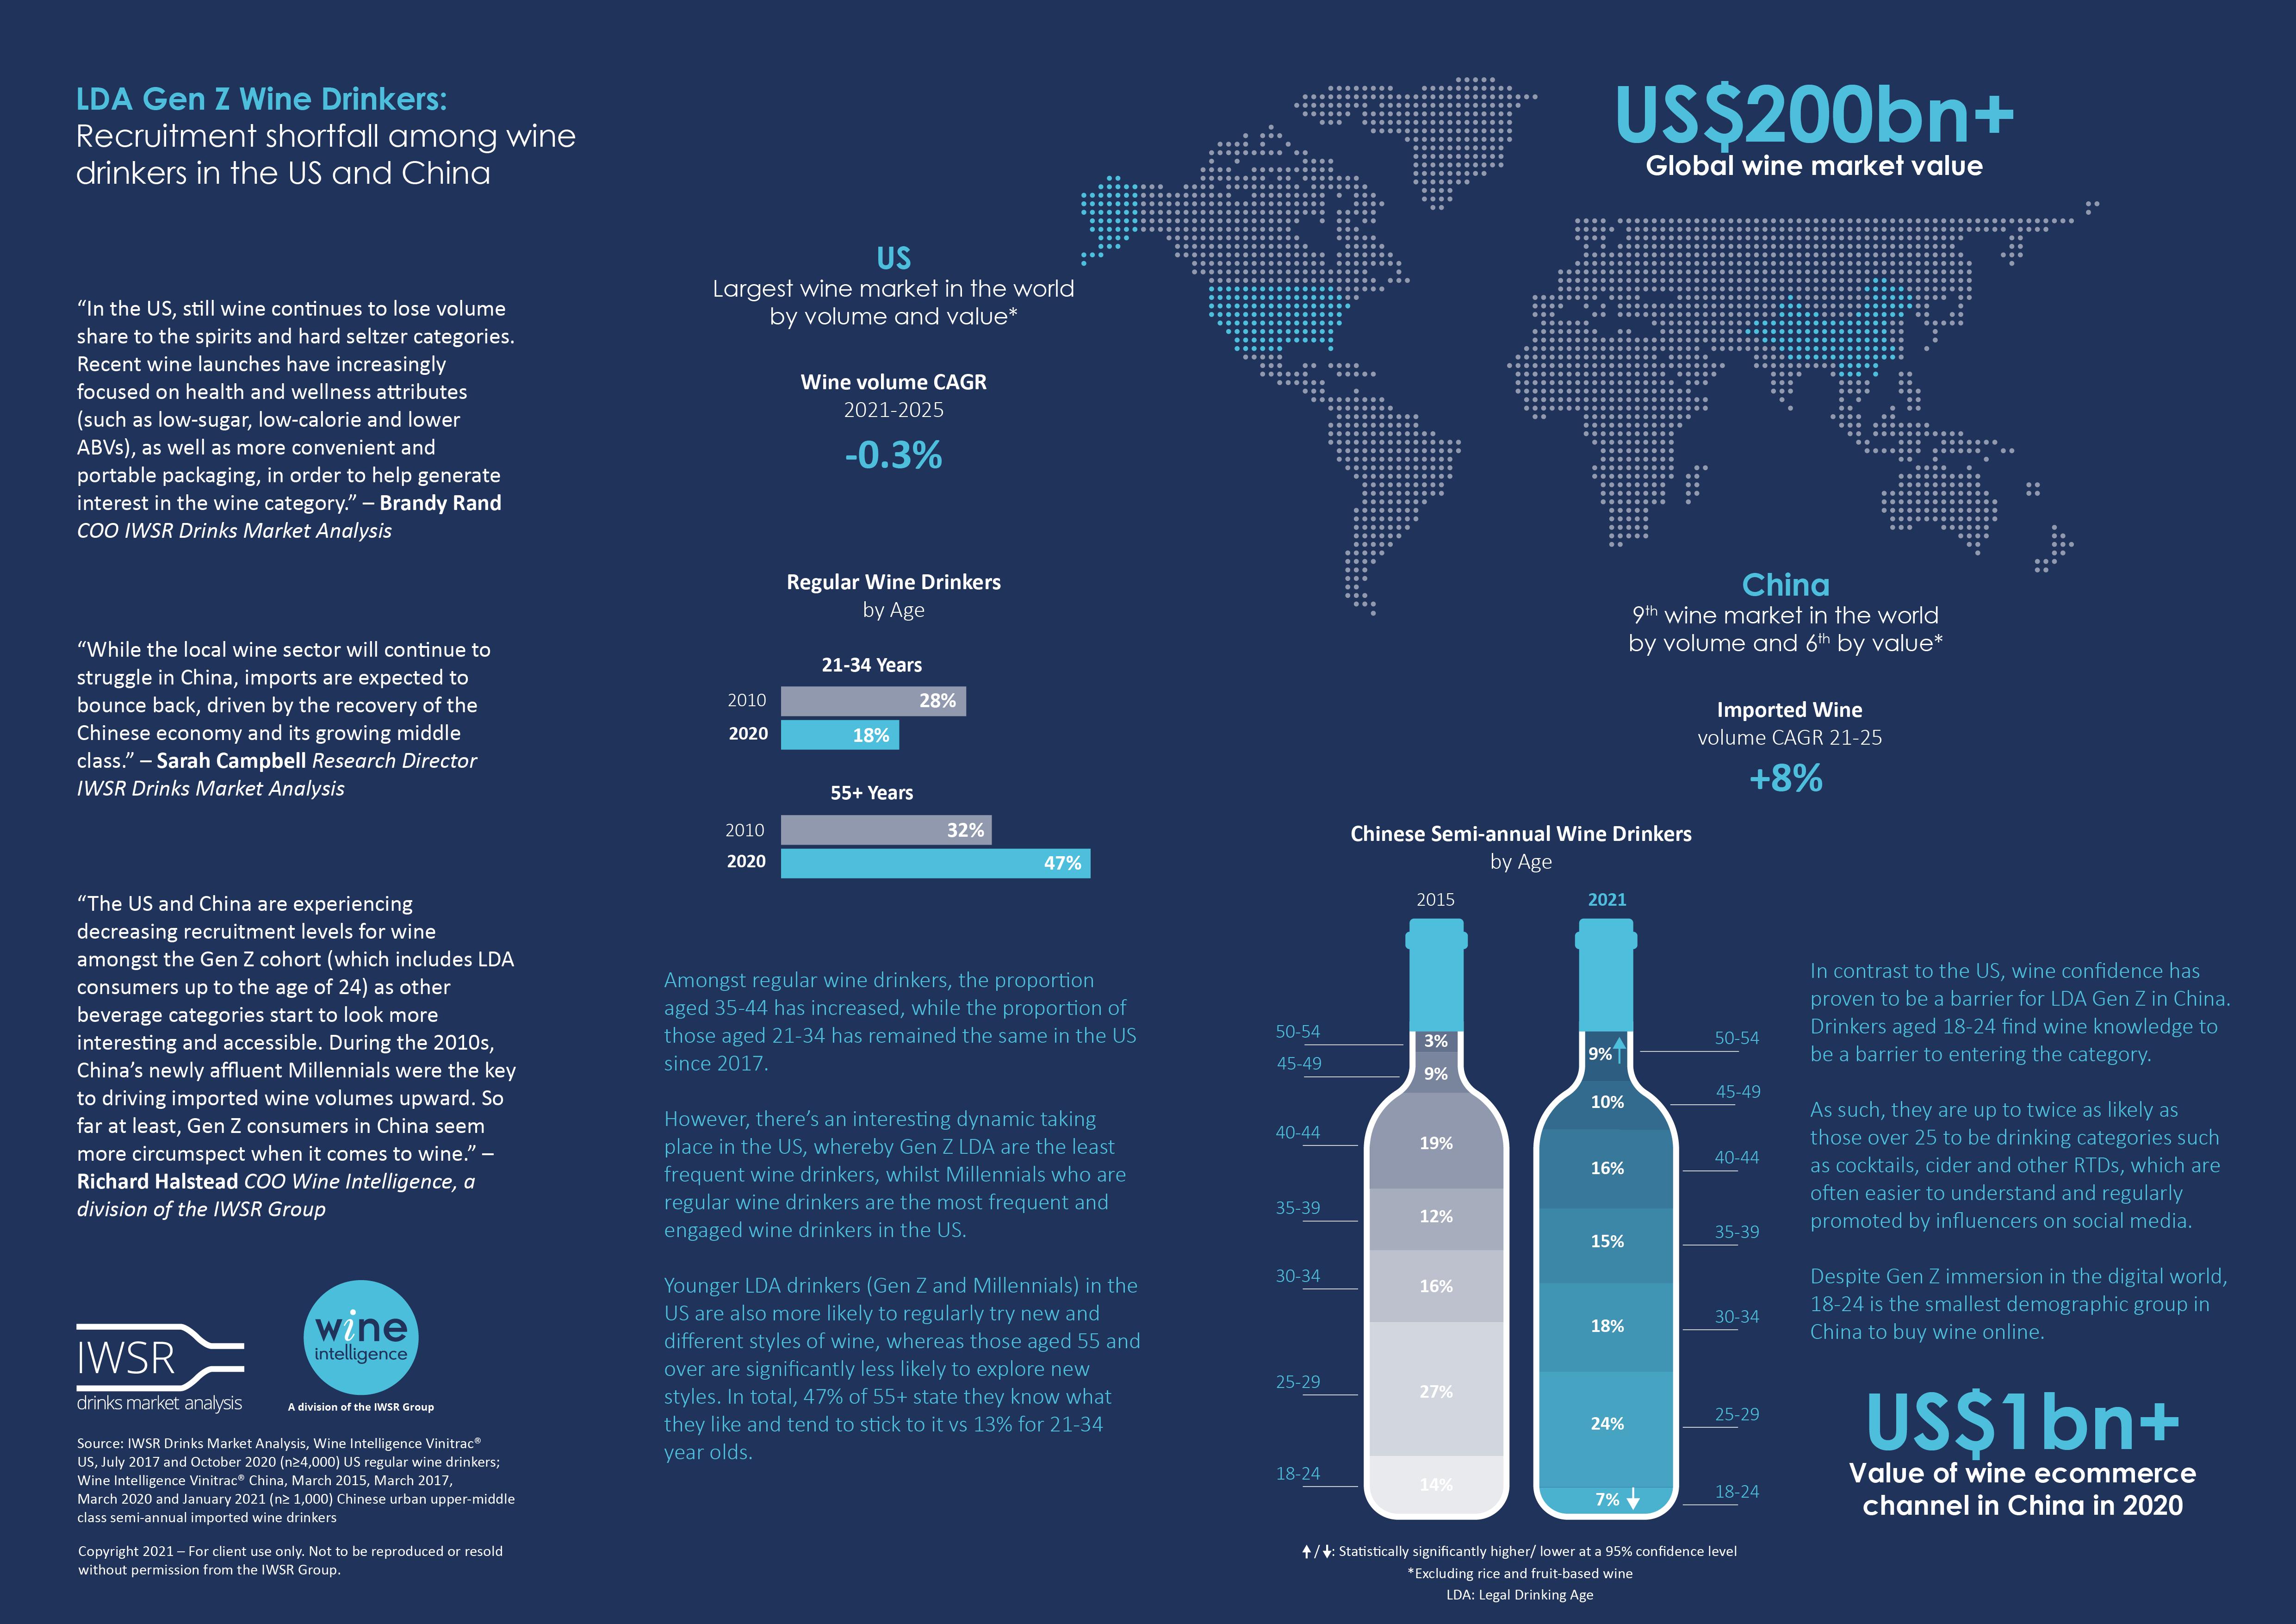 Wine Intelligence Infographic Recruitment shortfall in US and China wine markets - Recruitment shortfall among wine drinkers in the US and China [infographic]